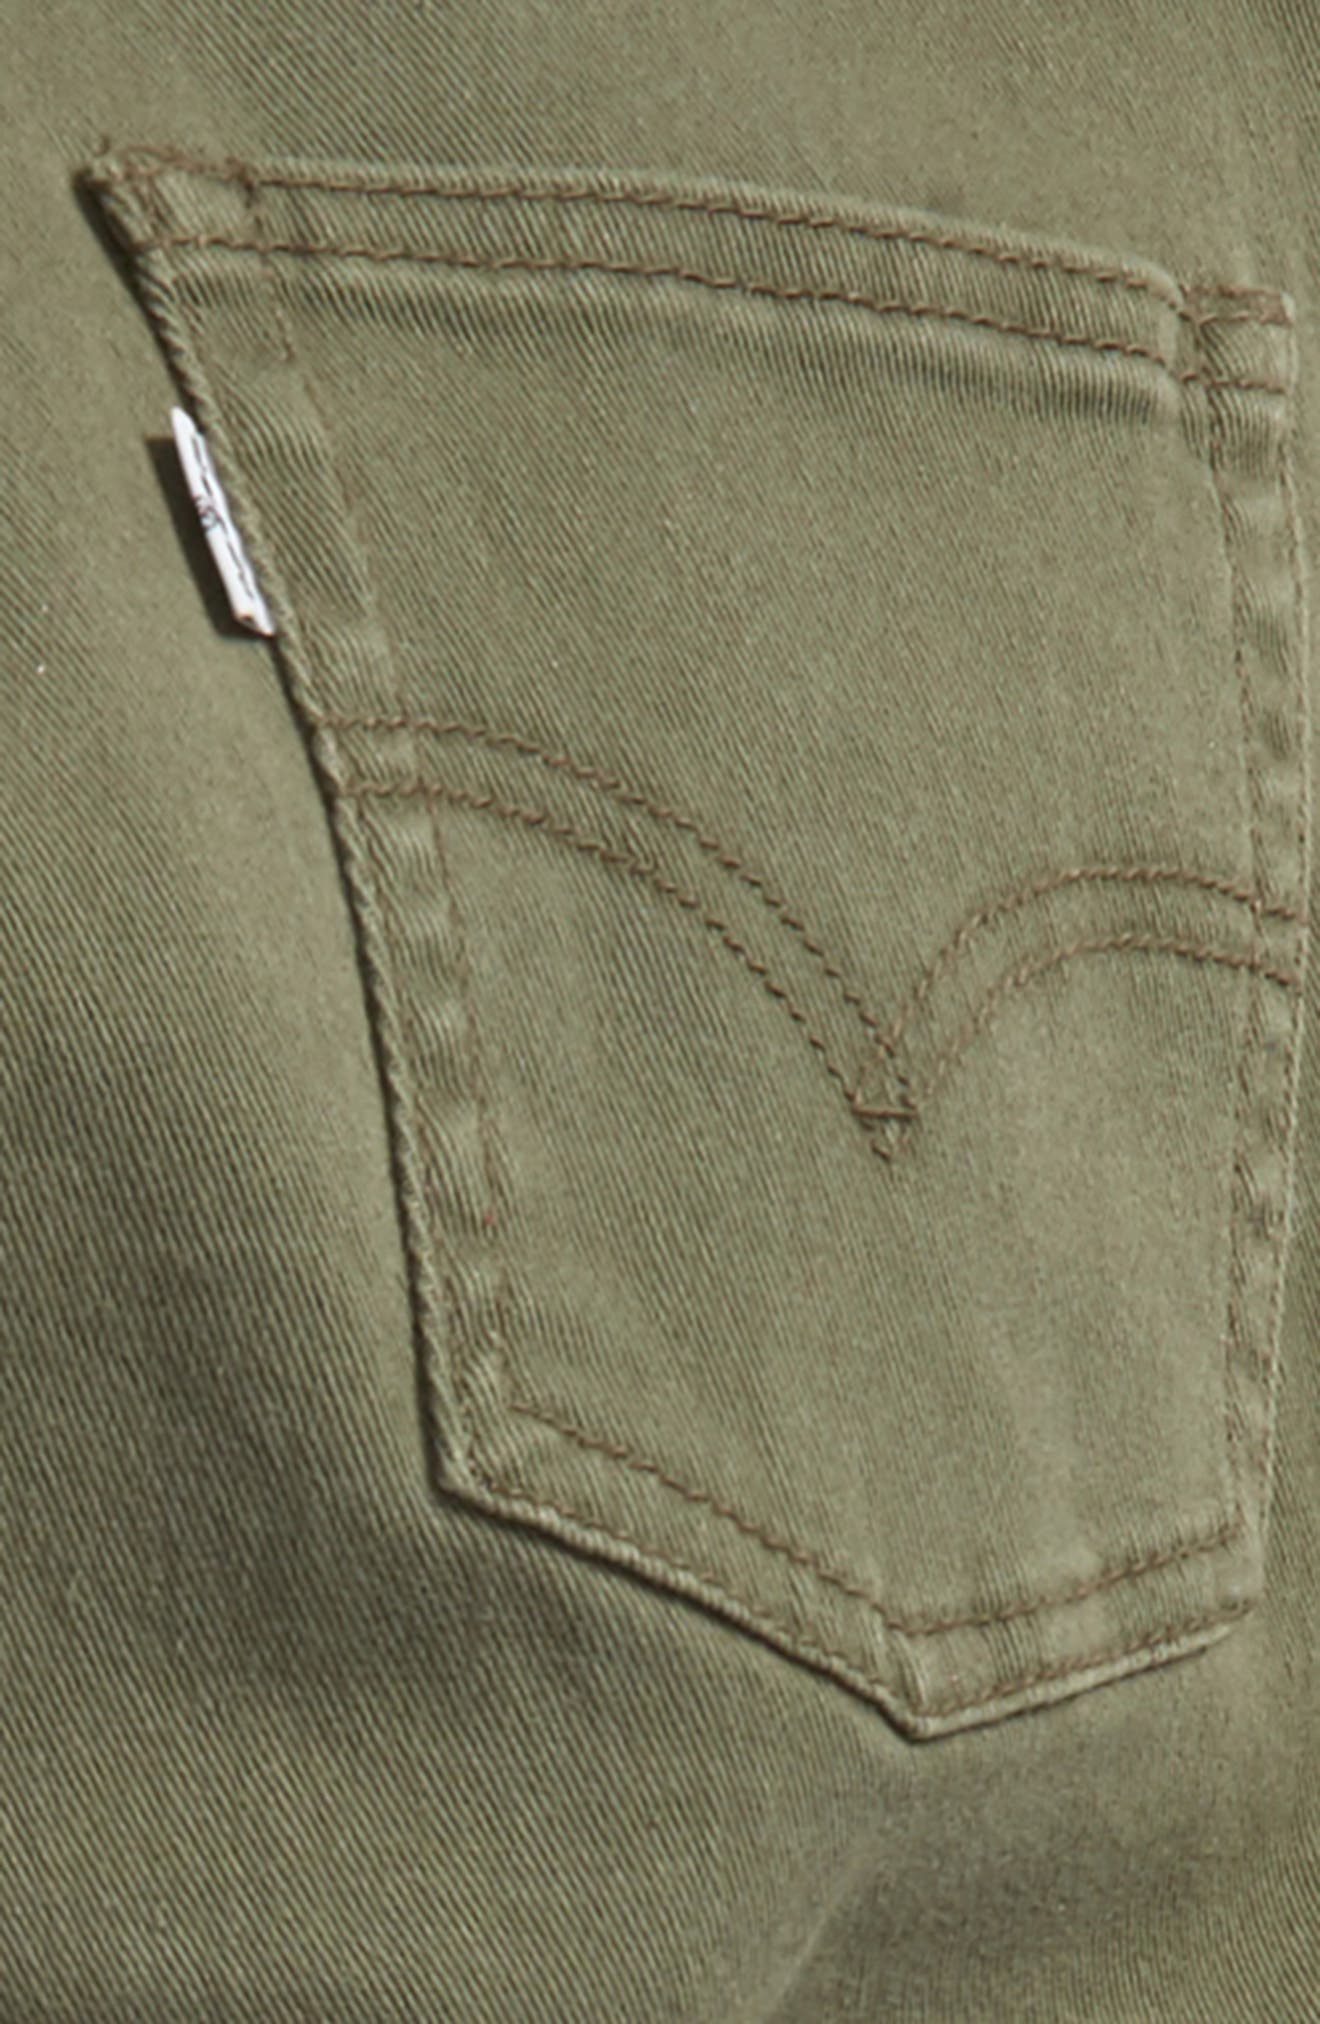 511 Slim Fit Jeans,                             Alternate thumbnail 2, color,                             Olive Night